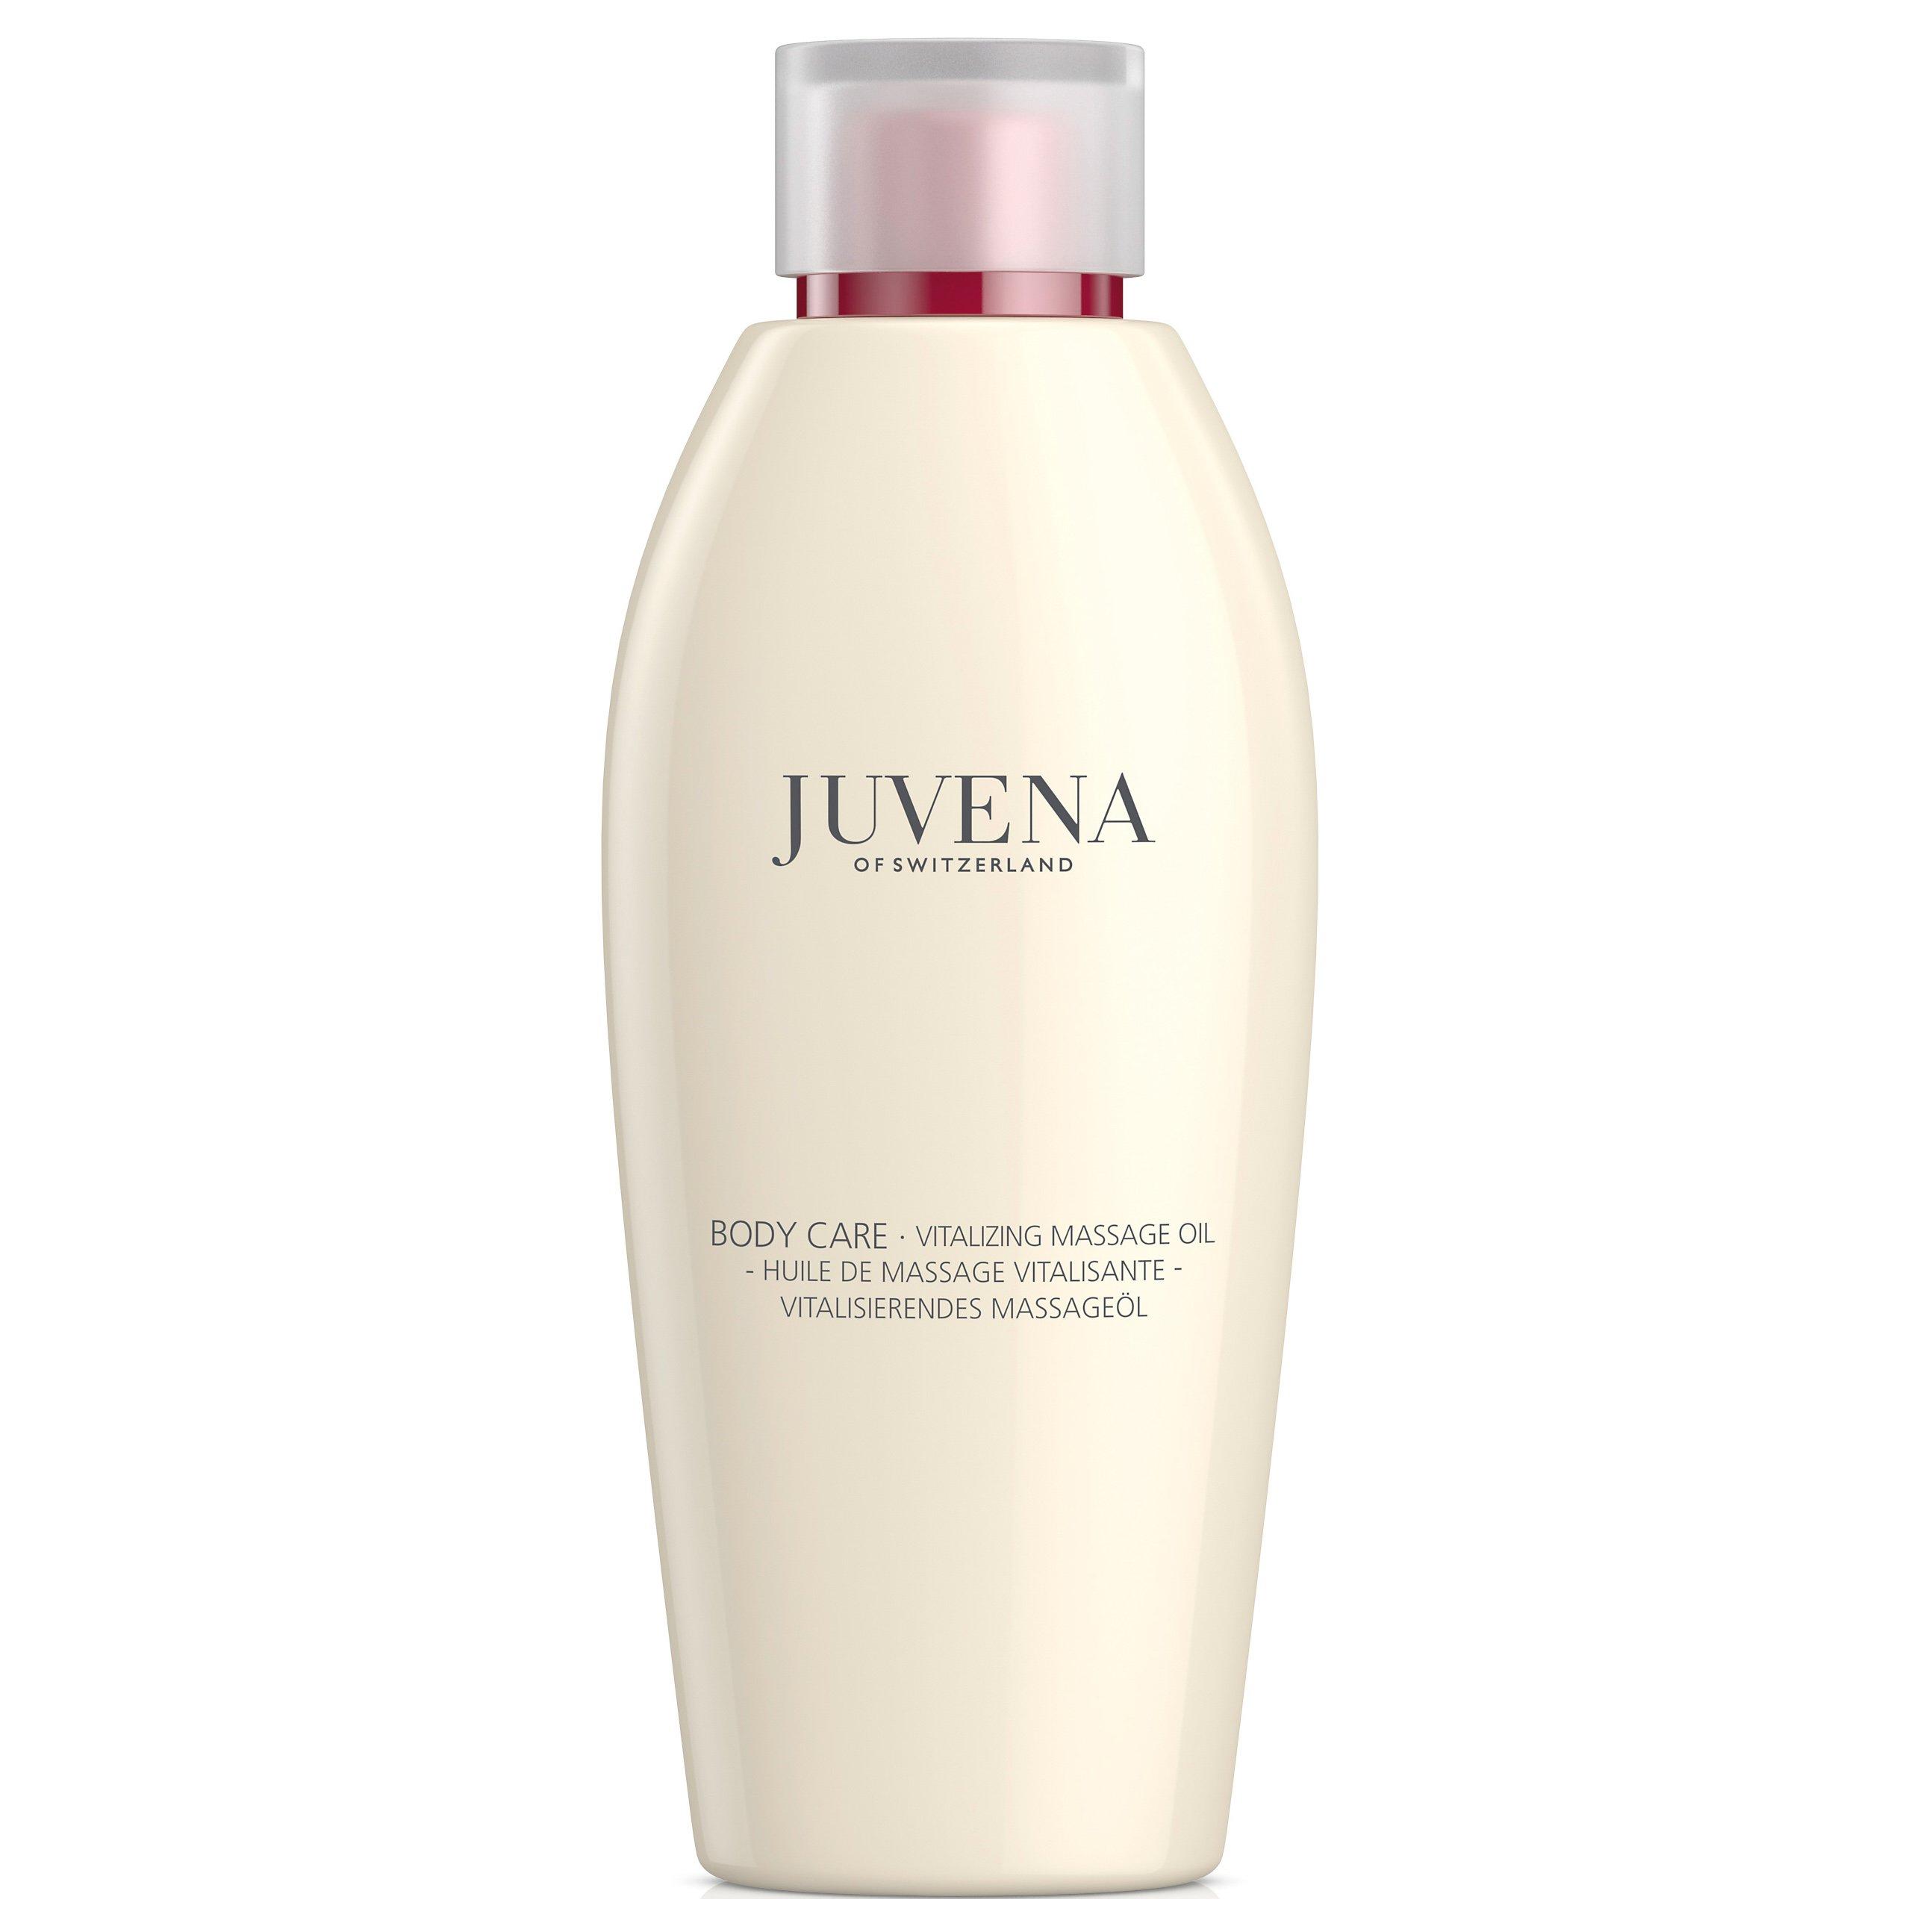 Juvena Body Care Vitalizing Massage Oil Πολύτιμο Έλαιο Μασάζ Σώματος που Αναζωογονεί τις Αισθήσεις & Θρέφει την Επιδερμίδα 200ml